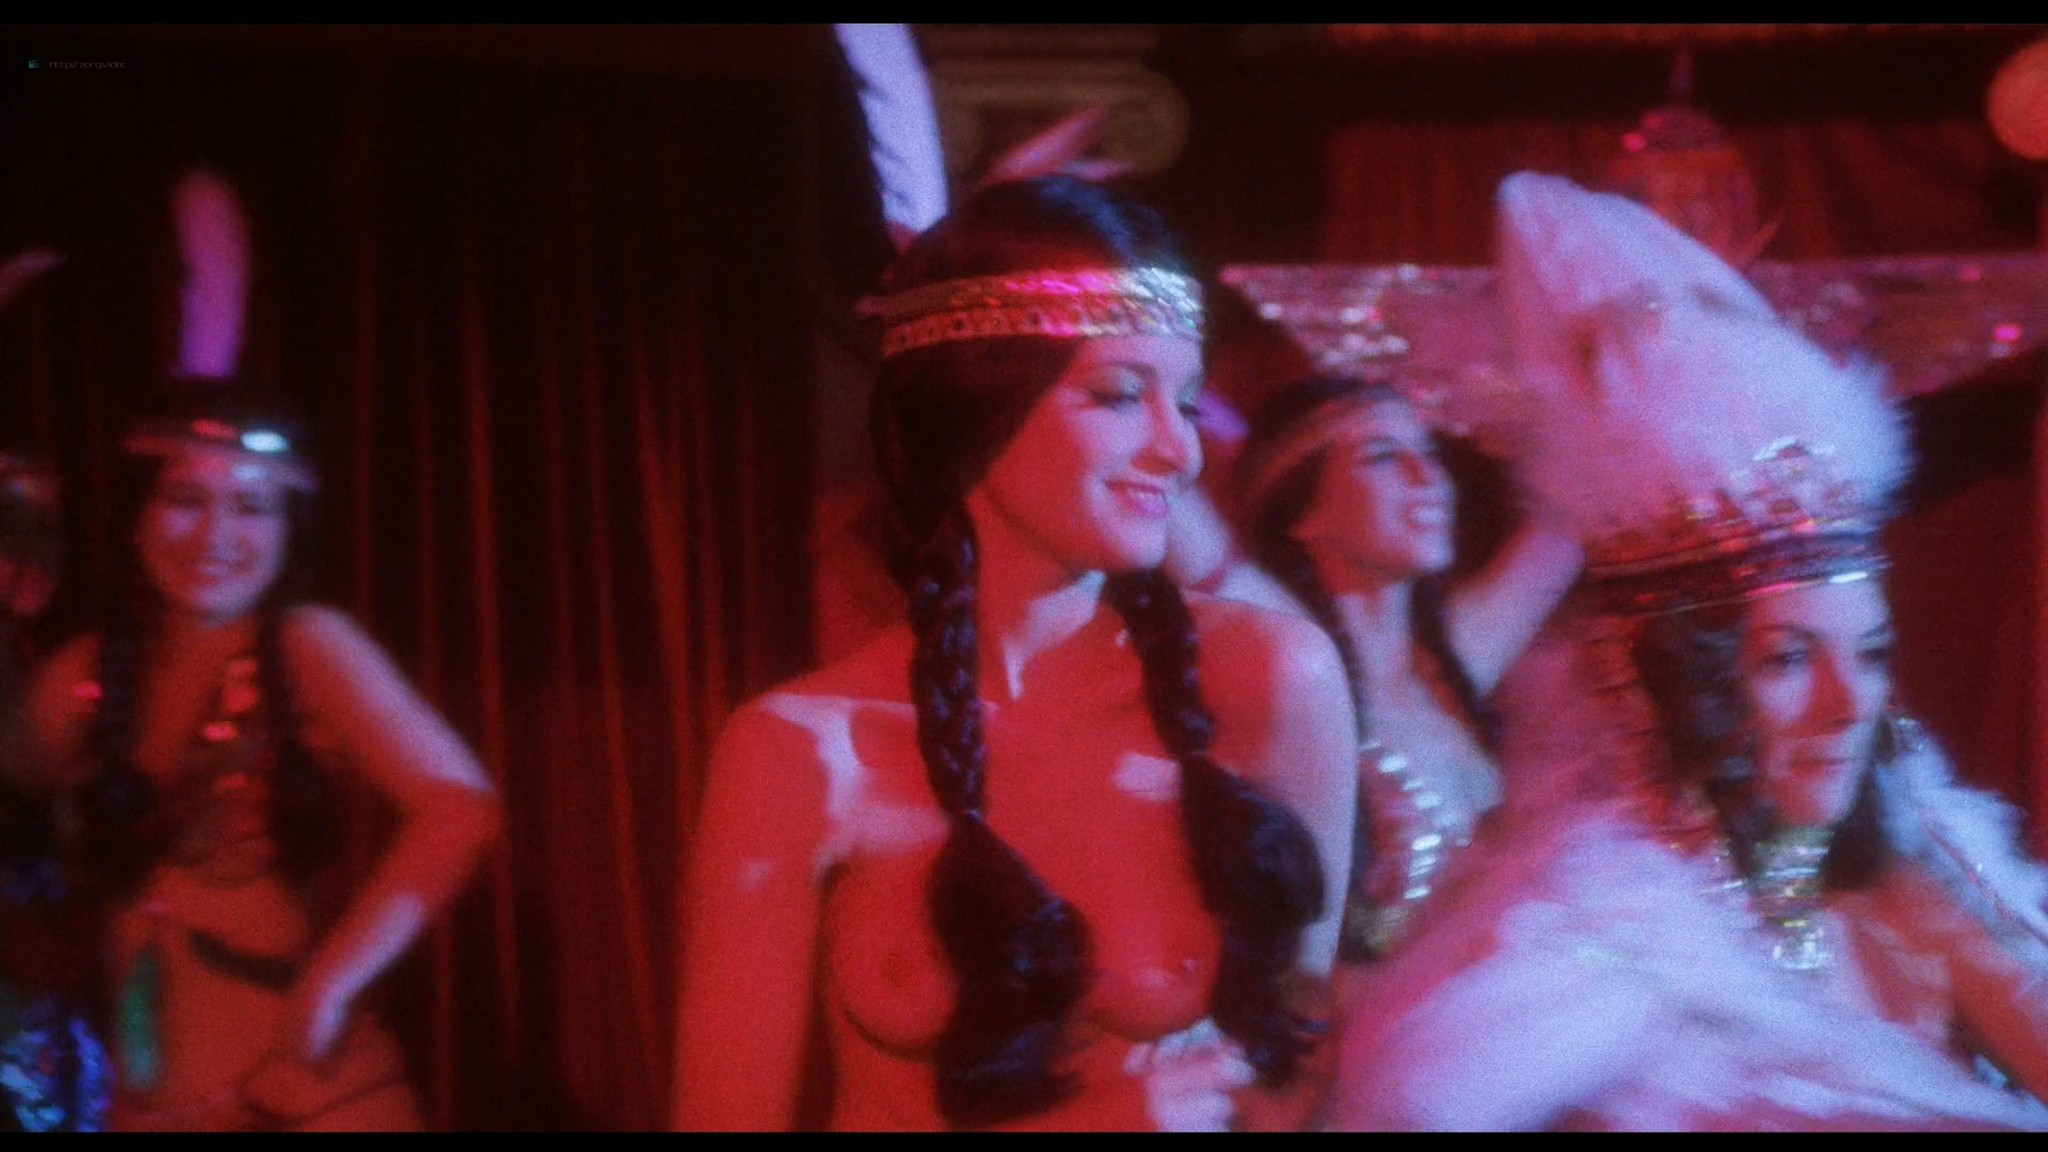 Bridget Fonda nude butt boobs Britt Ekland nude Joanne Whalley hot - Scandal (1989) HD 1080p BluRay (12)